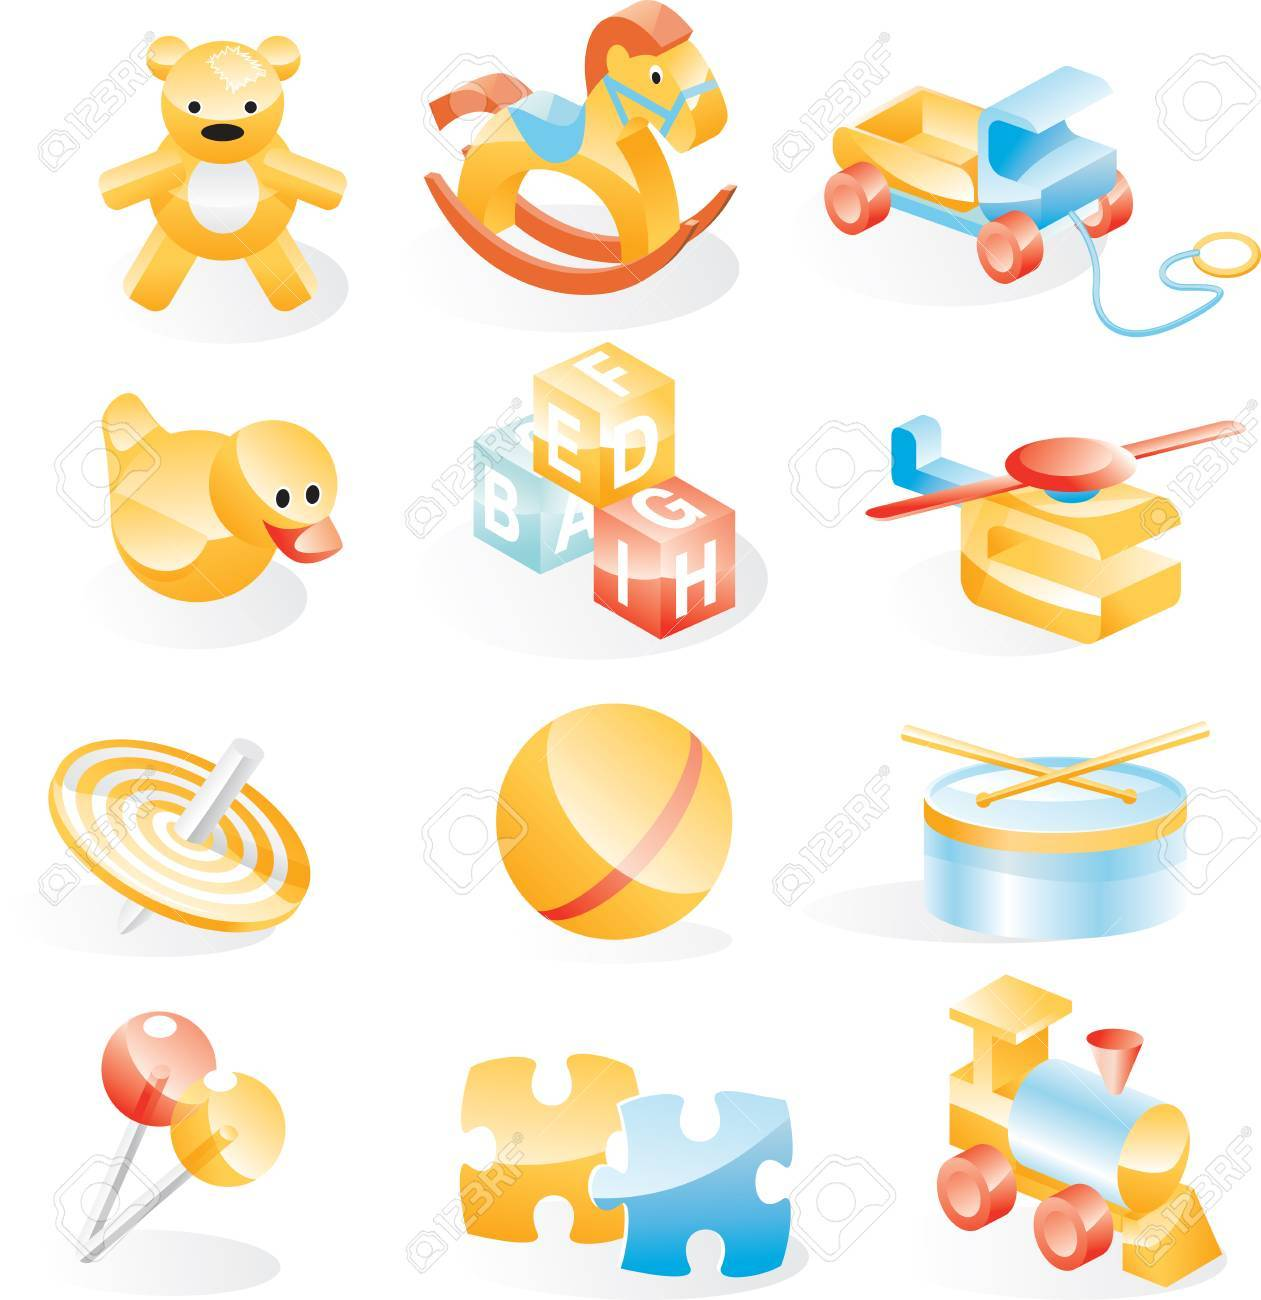 Toys icon set Stock Vector - 4397244